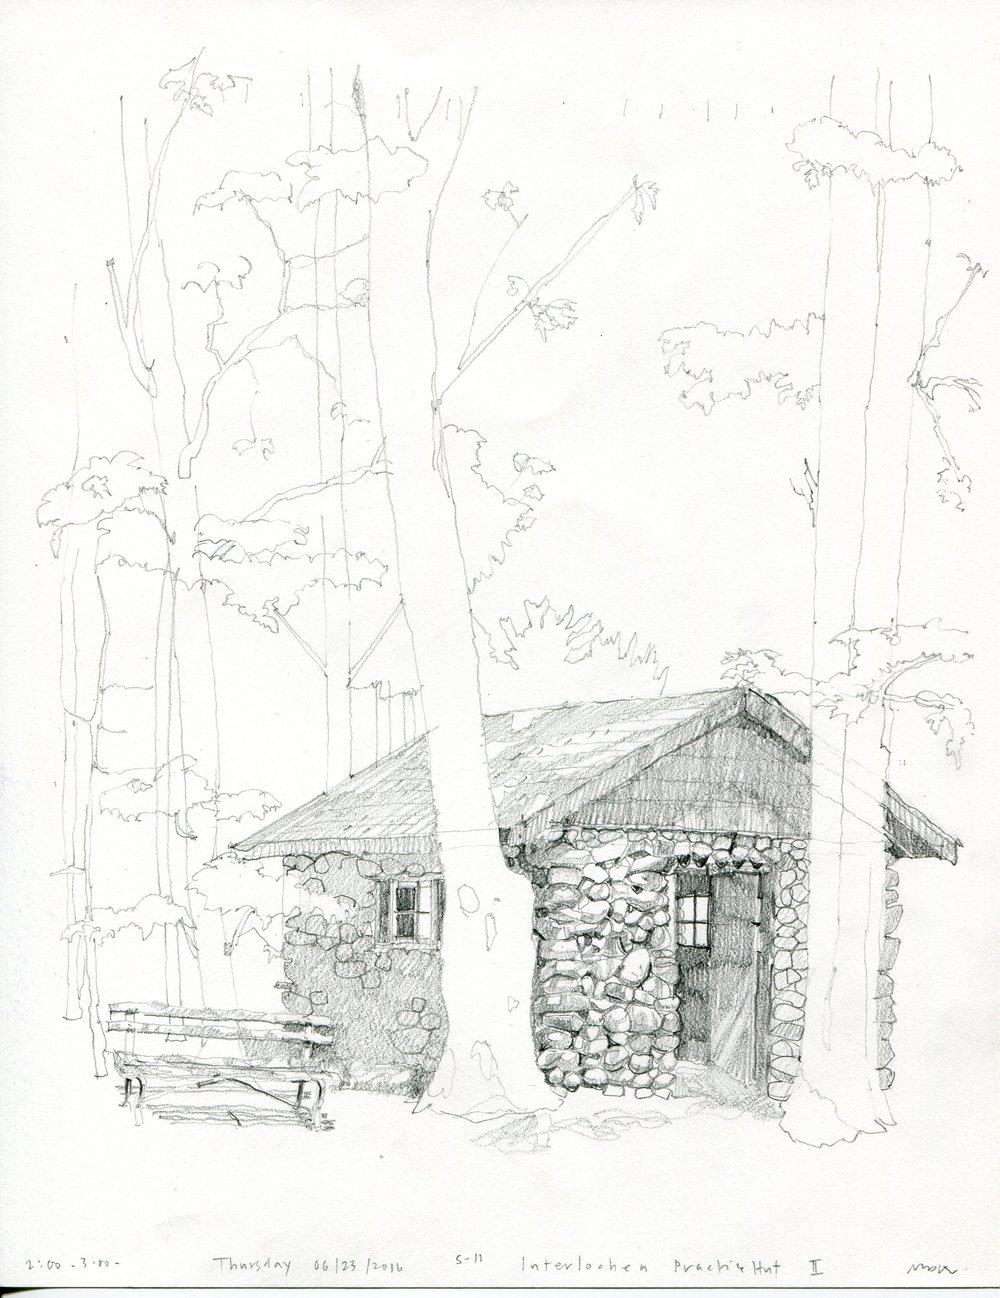 2016 Interlochen practice hut II002.jpg